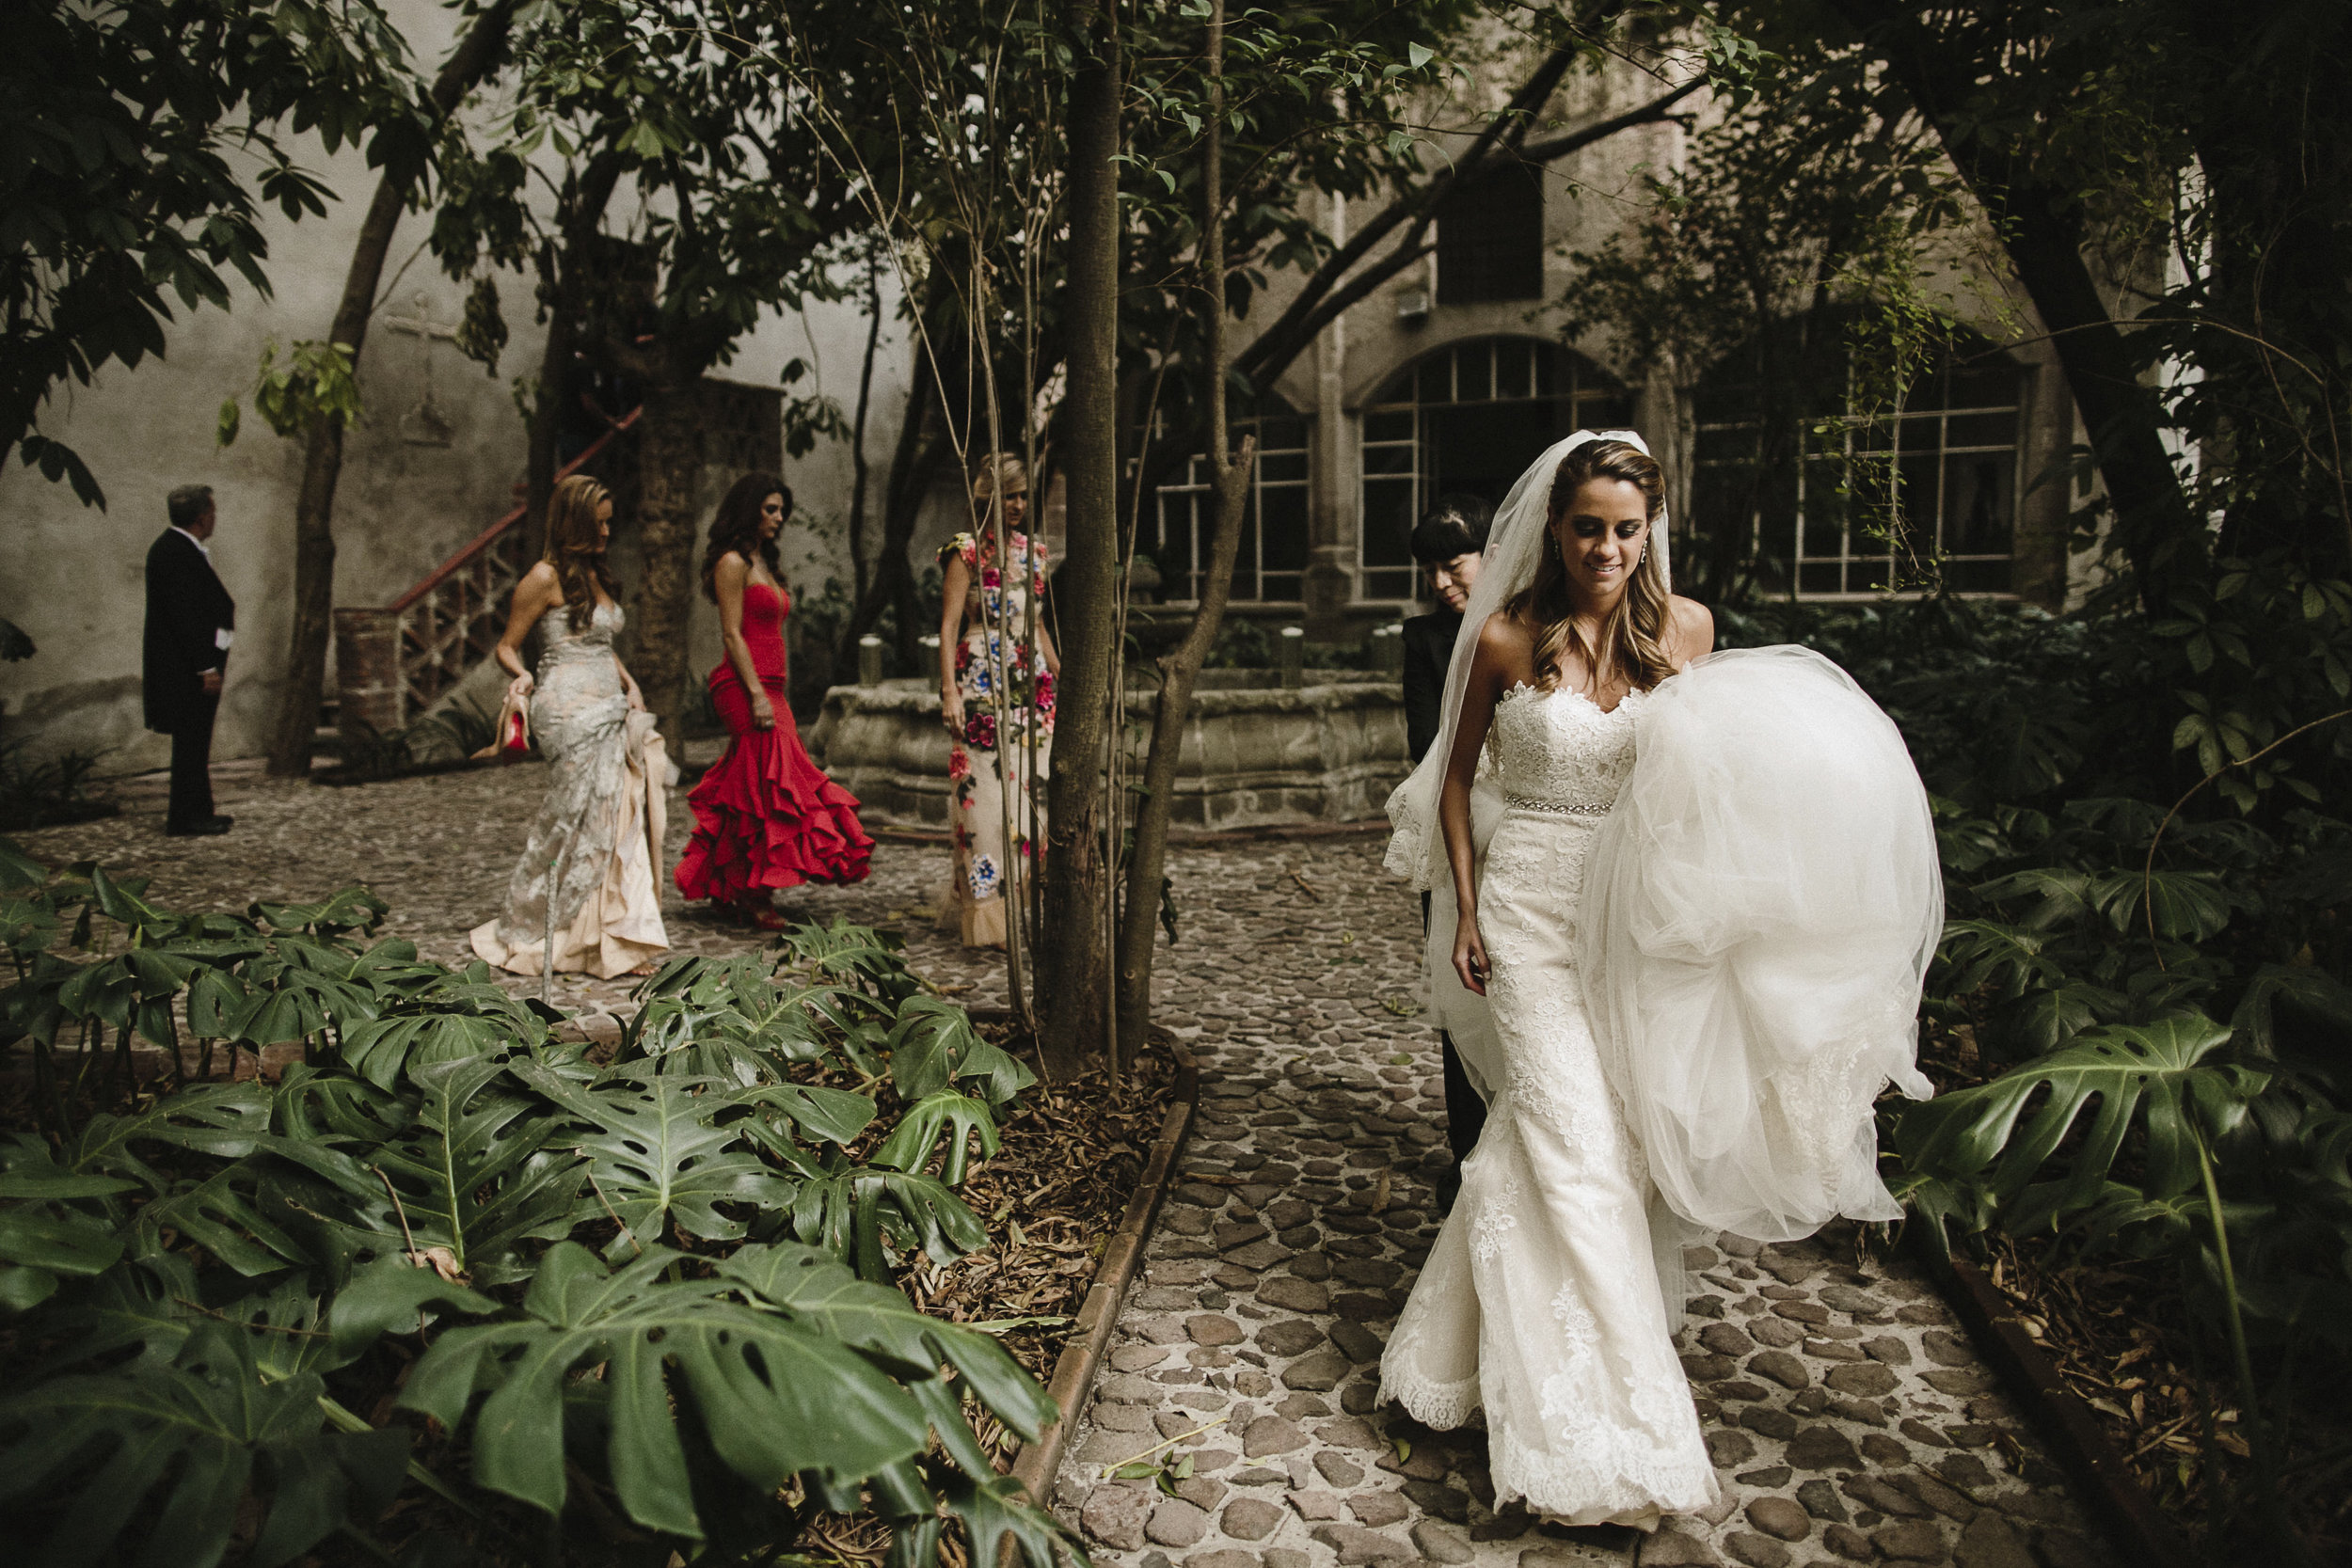 alfonso_flores_destination_wedding_photogrpahy_paola_alonso-340.JPG